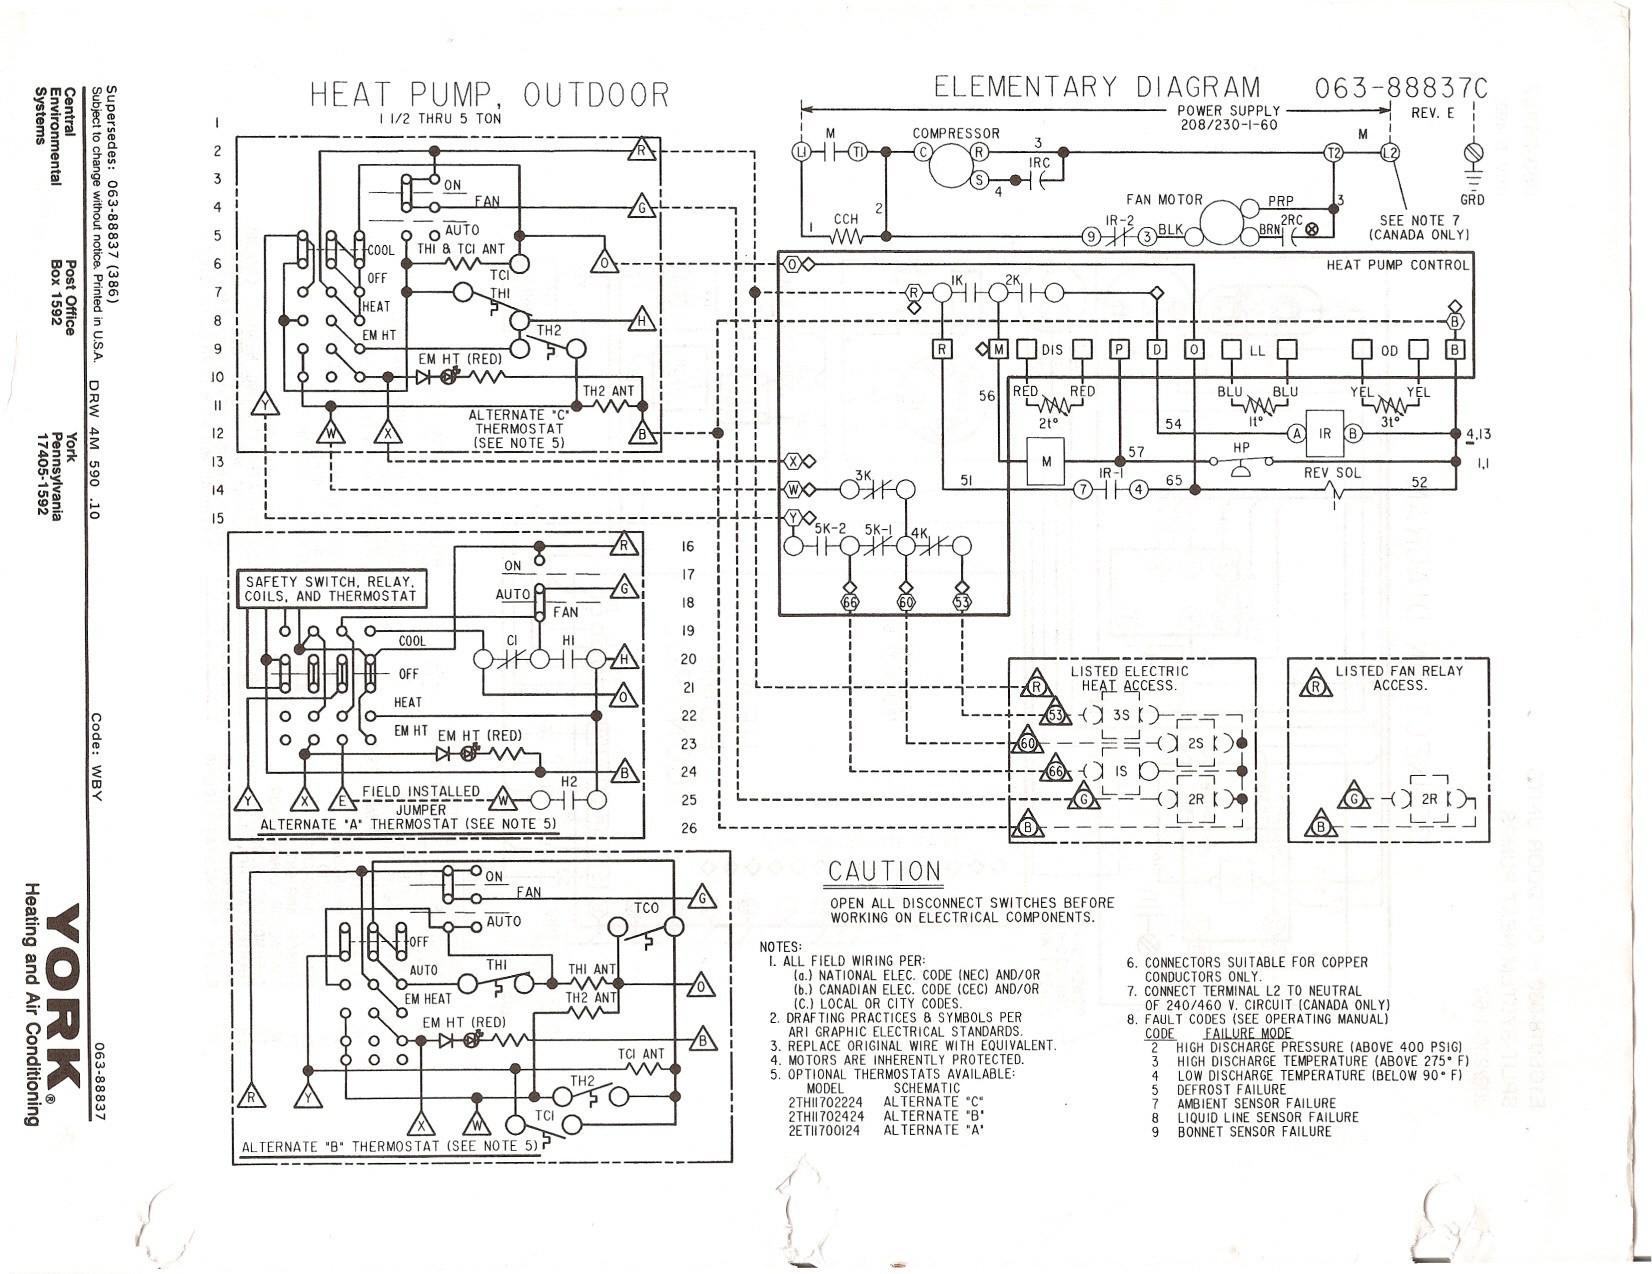 free wiring diagram Wiring Diagram For Ac Unit Best Goodman Heat Pump Package